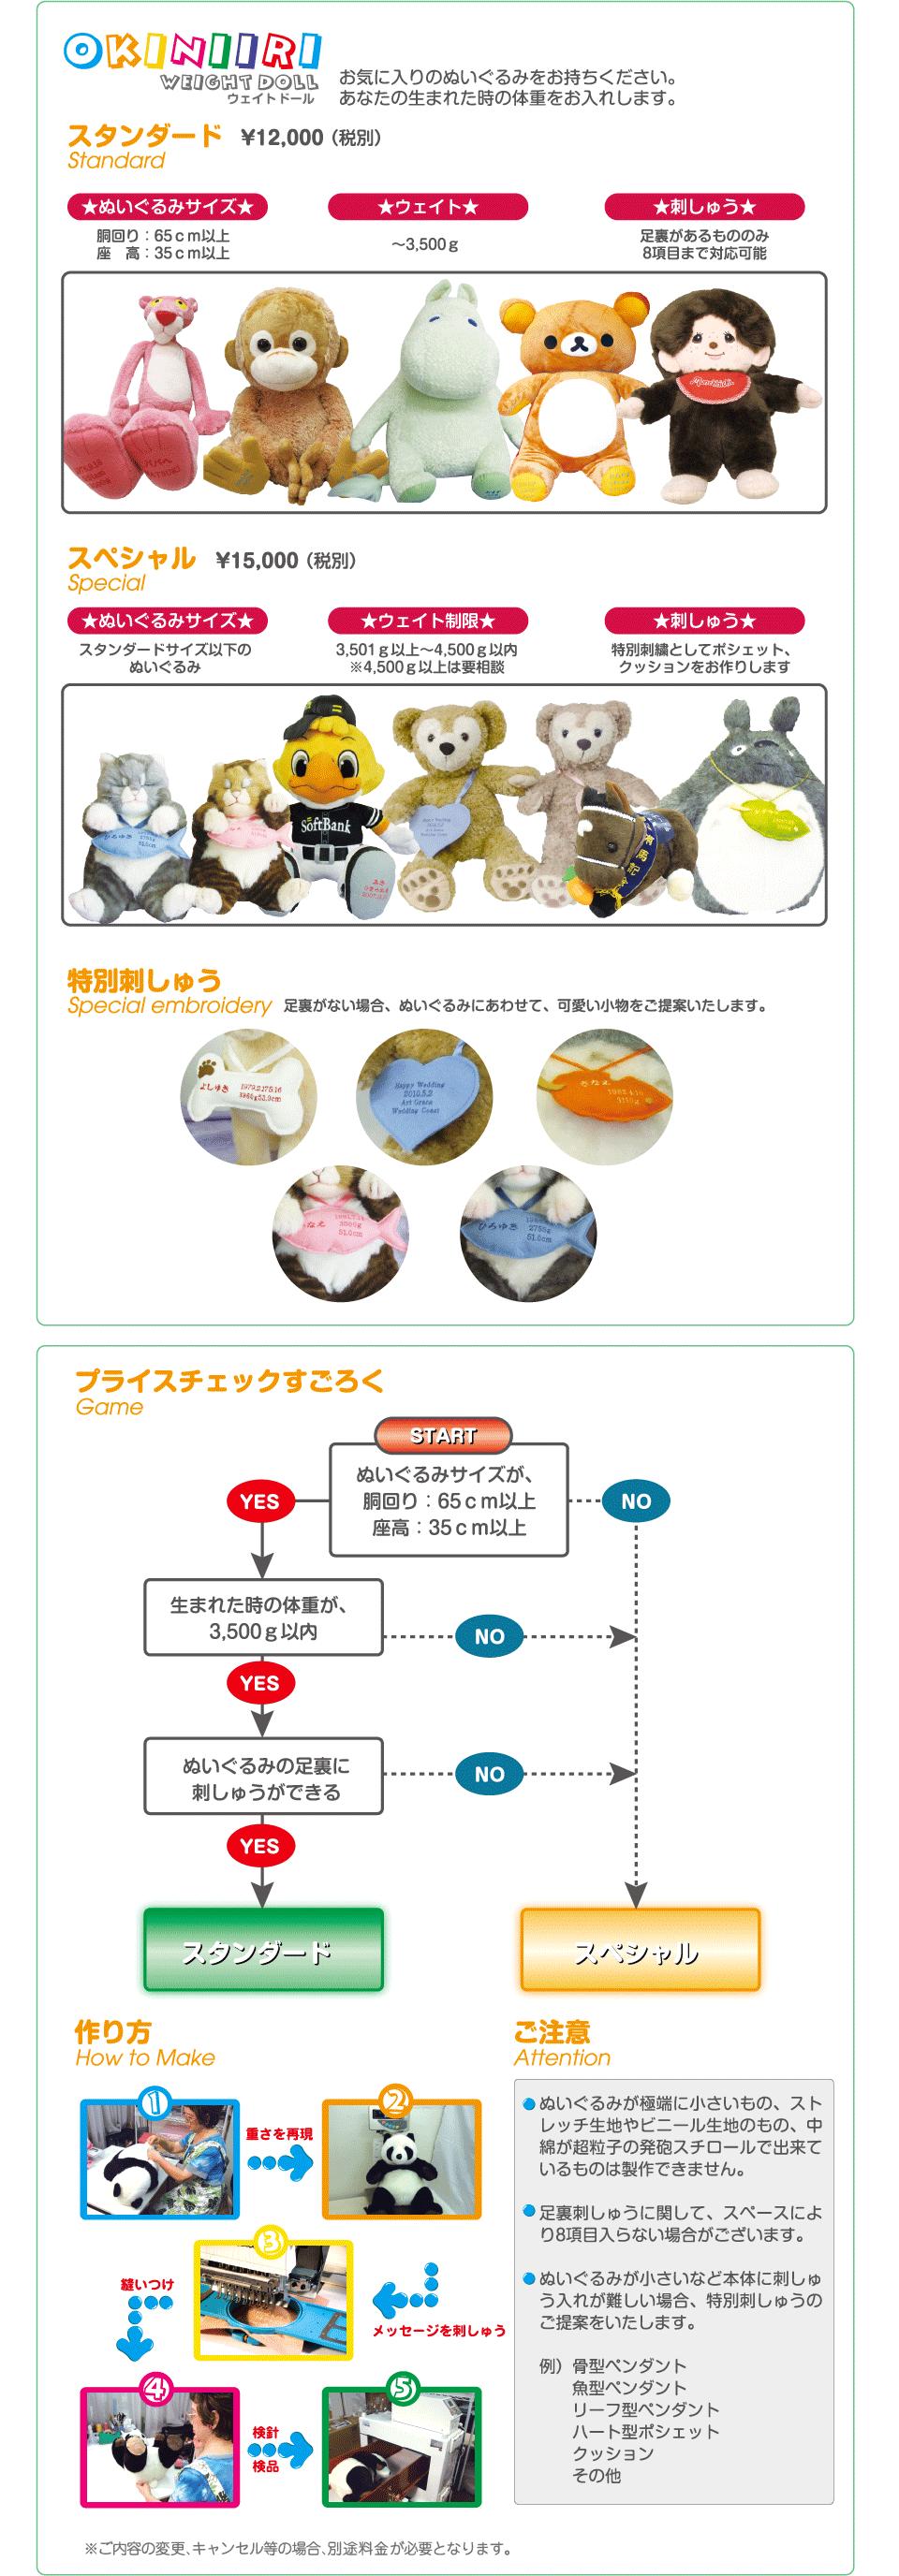 okiniiri(お気に入り)ウェイトドール